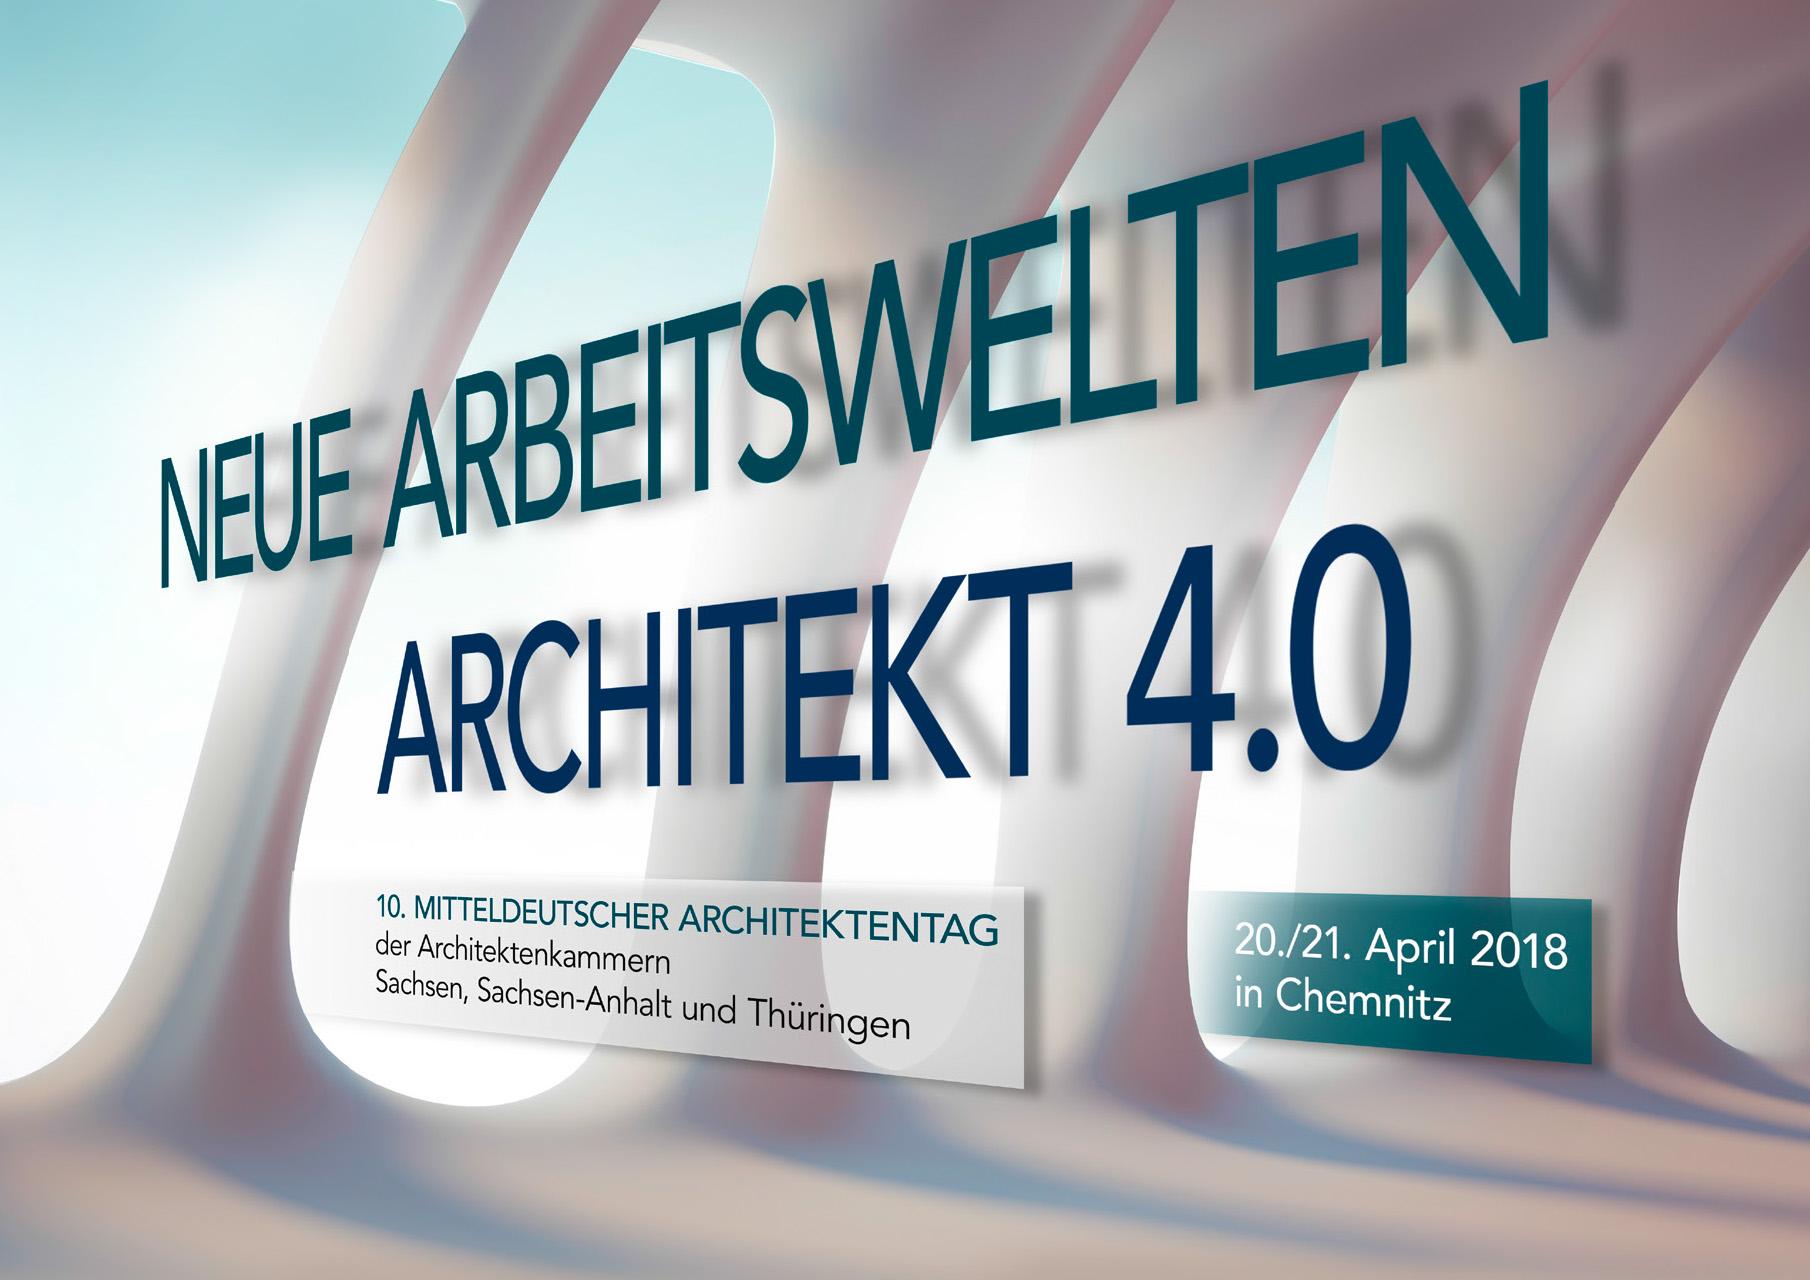 Architekt Chemnitz mitteldeutscher architektentag 2018 architektenkammer thüringen